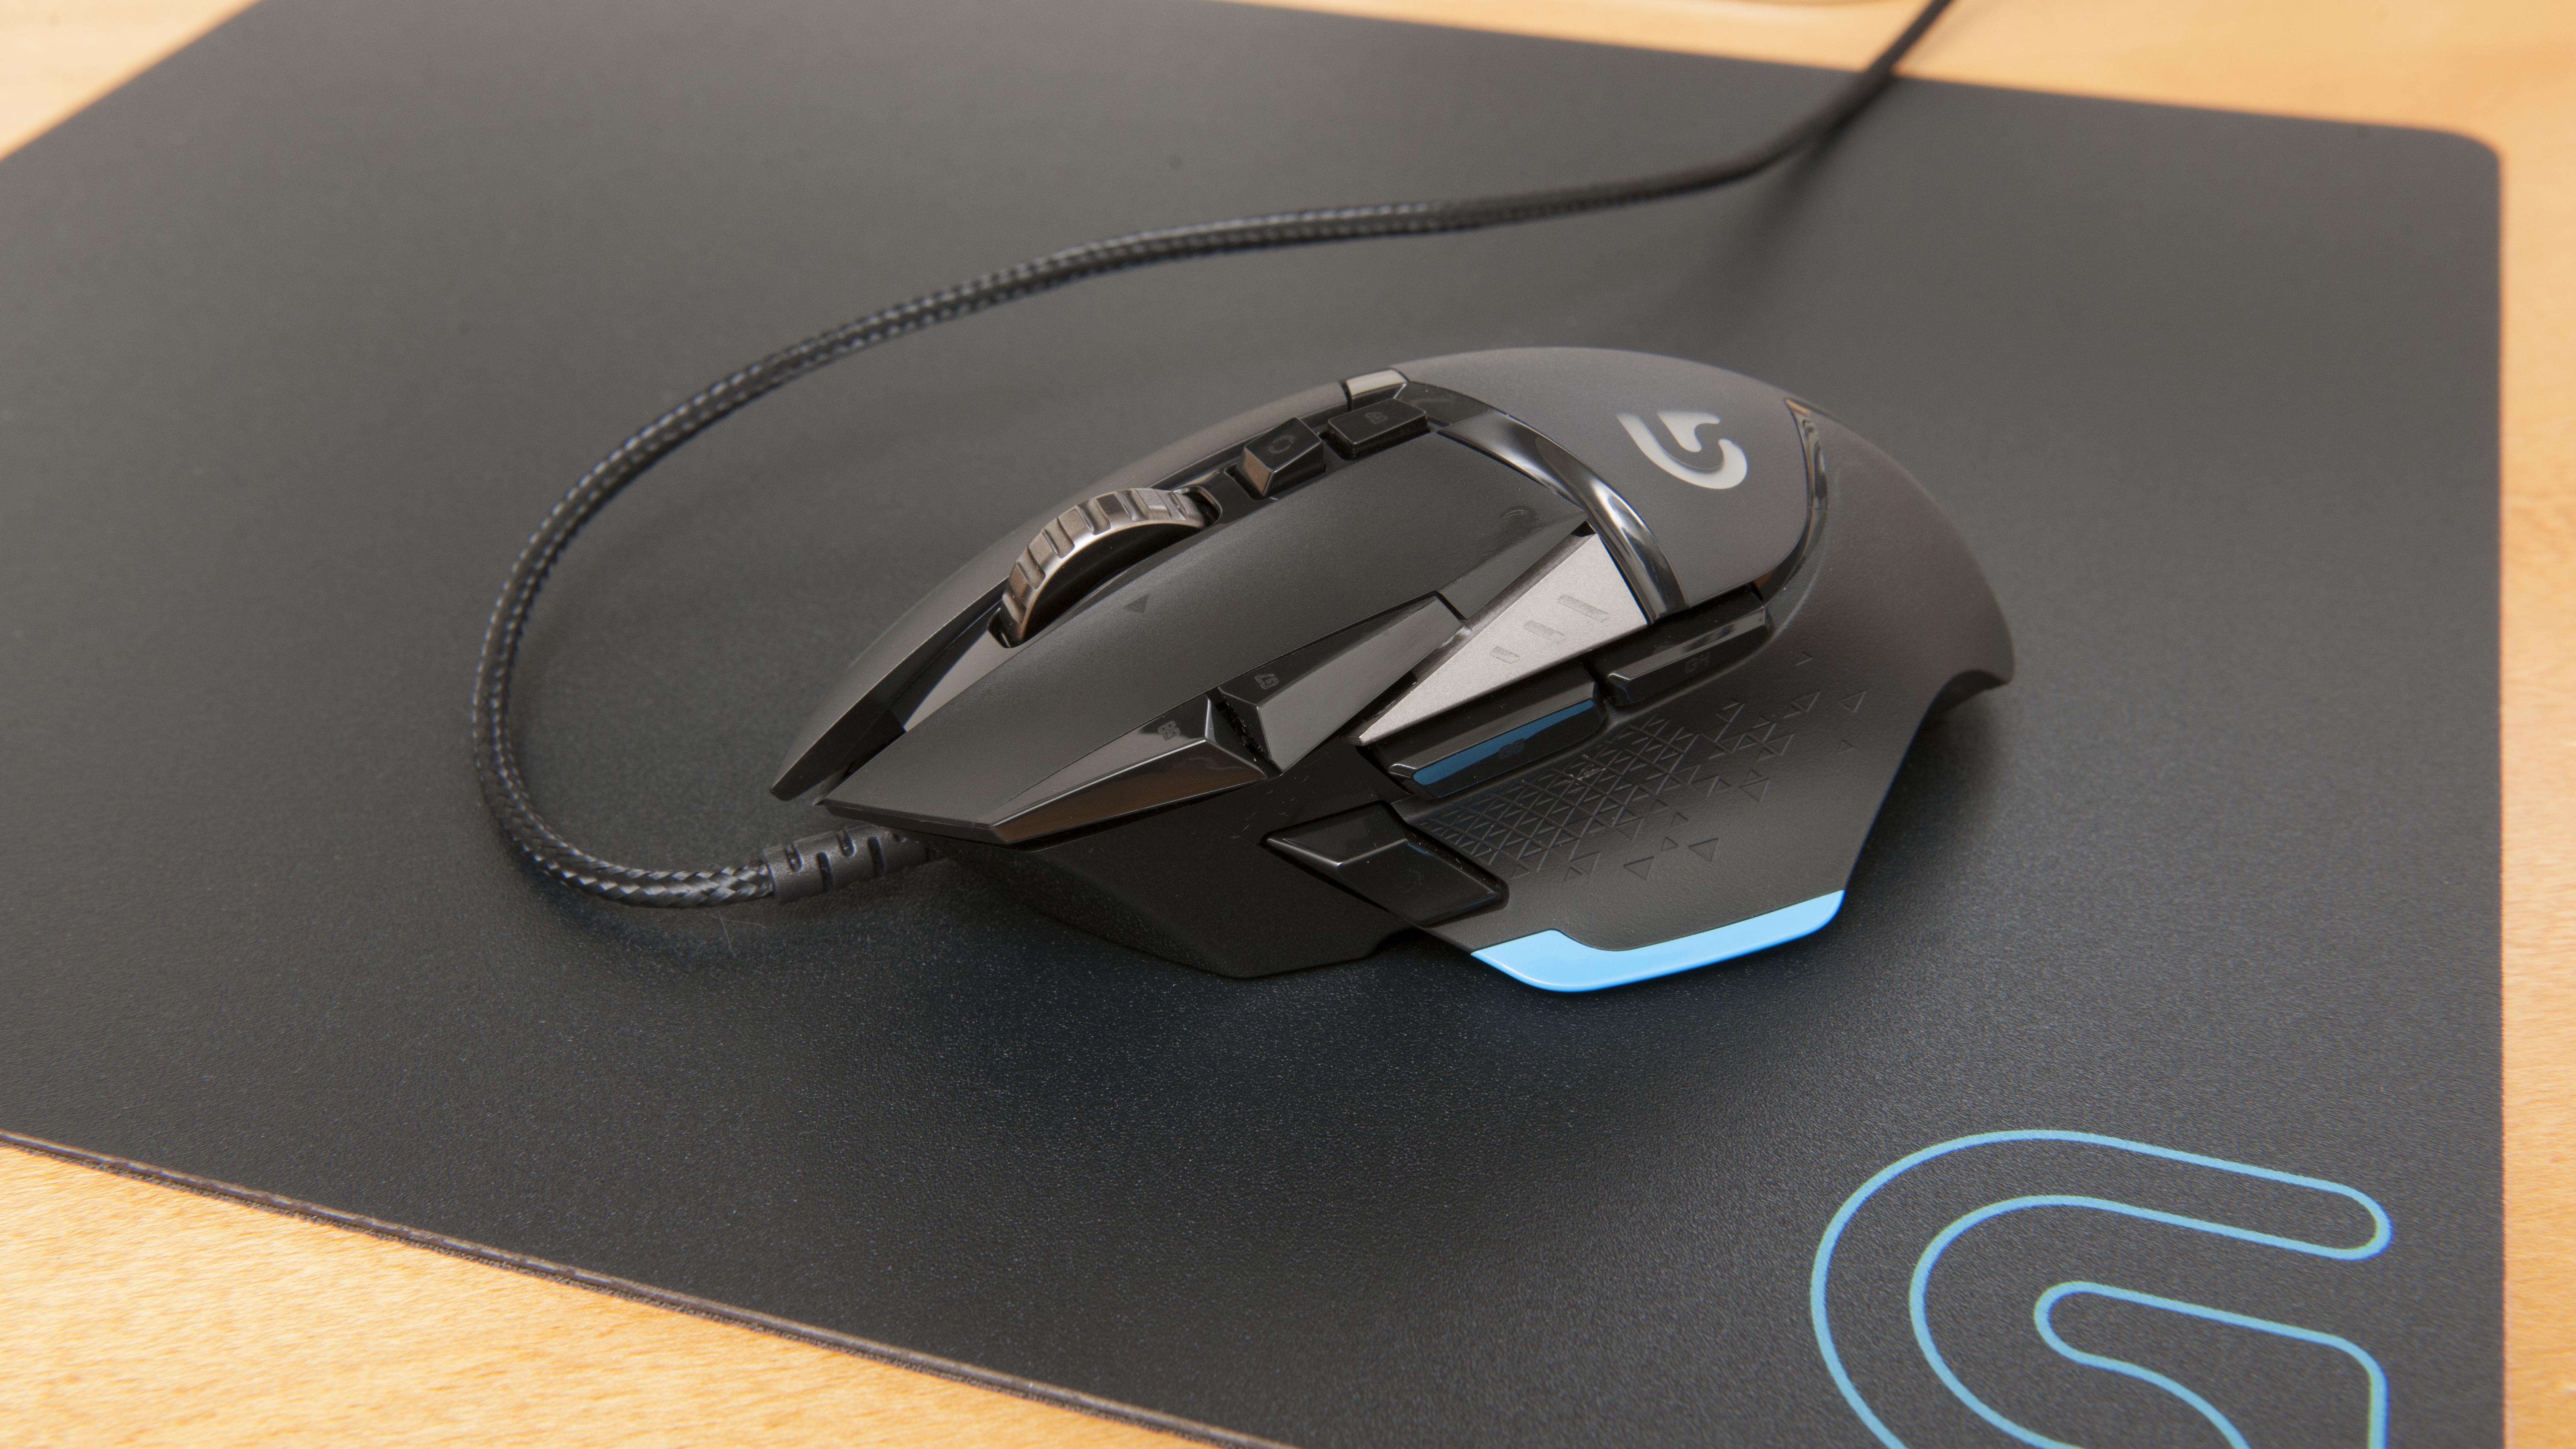 Logitech G502 Proteus Core Gaming Mouse Review Techradar